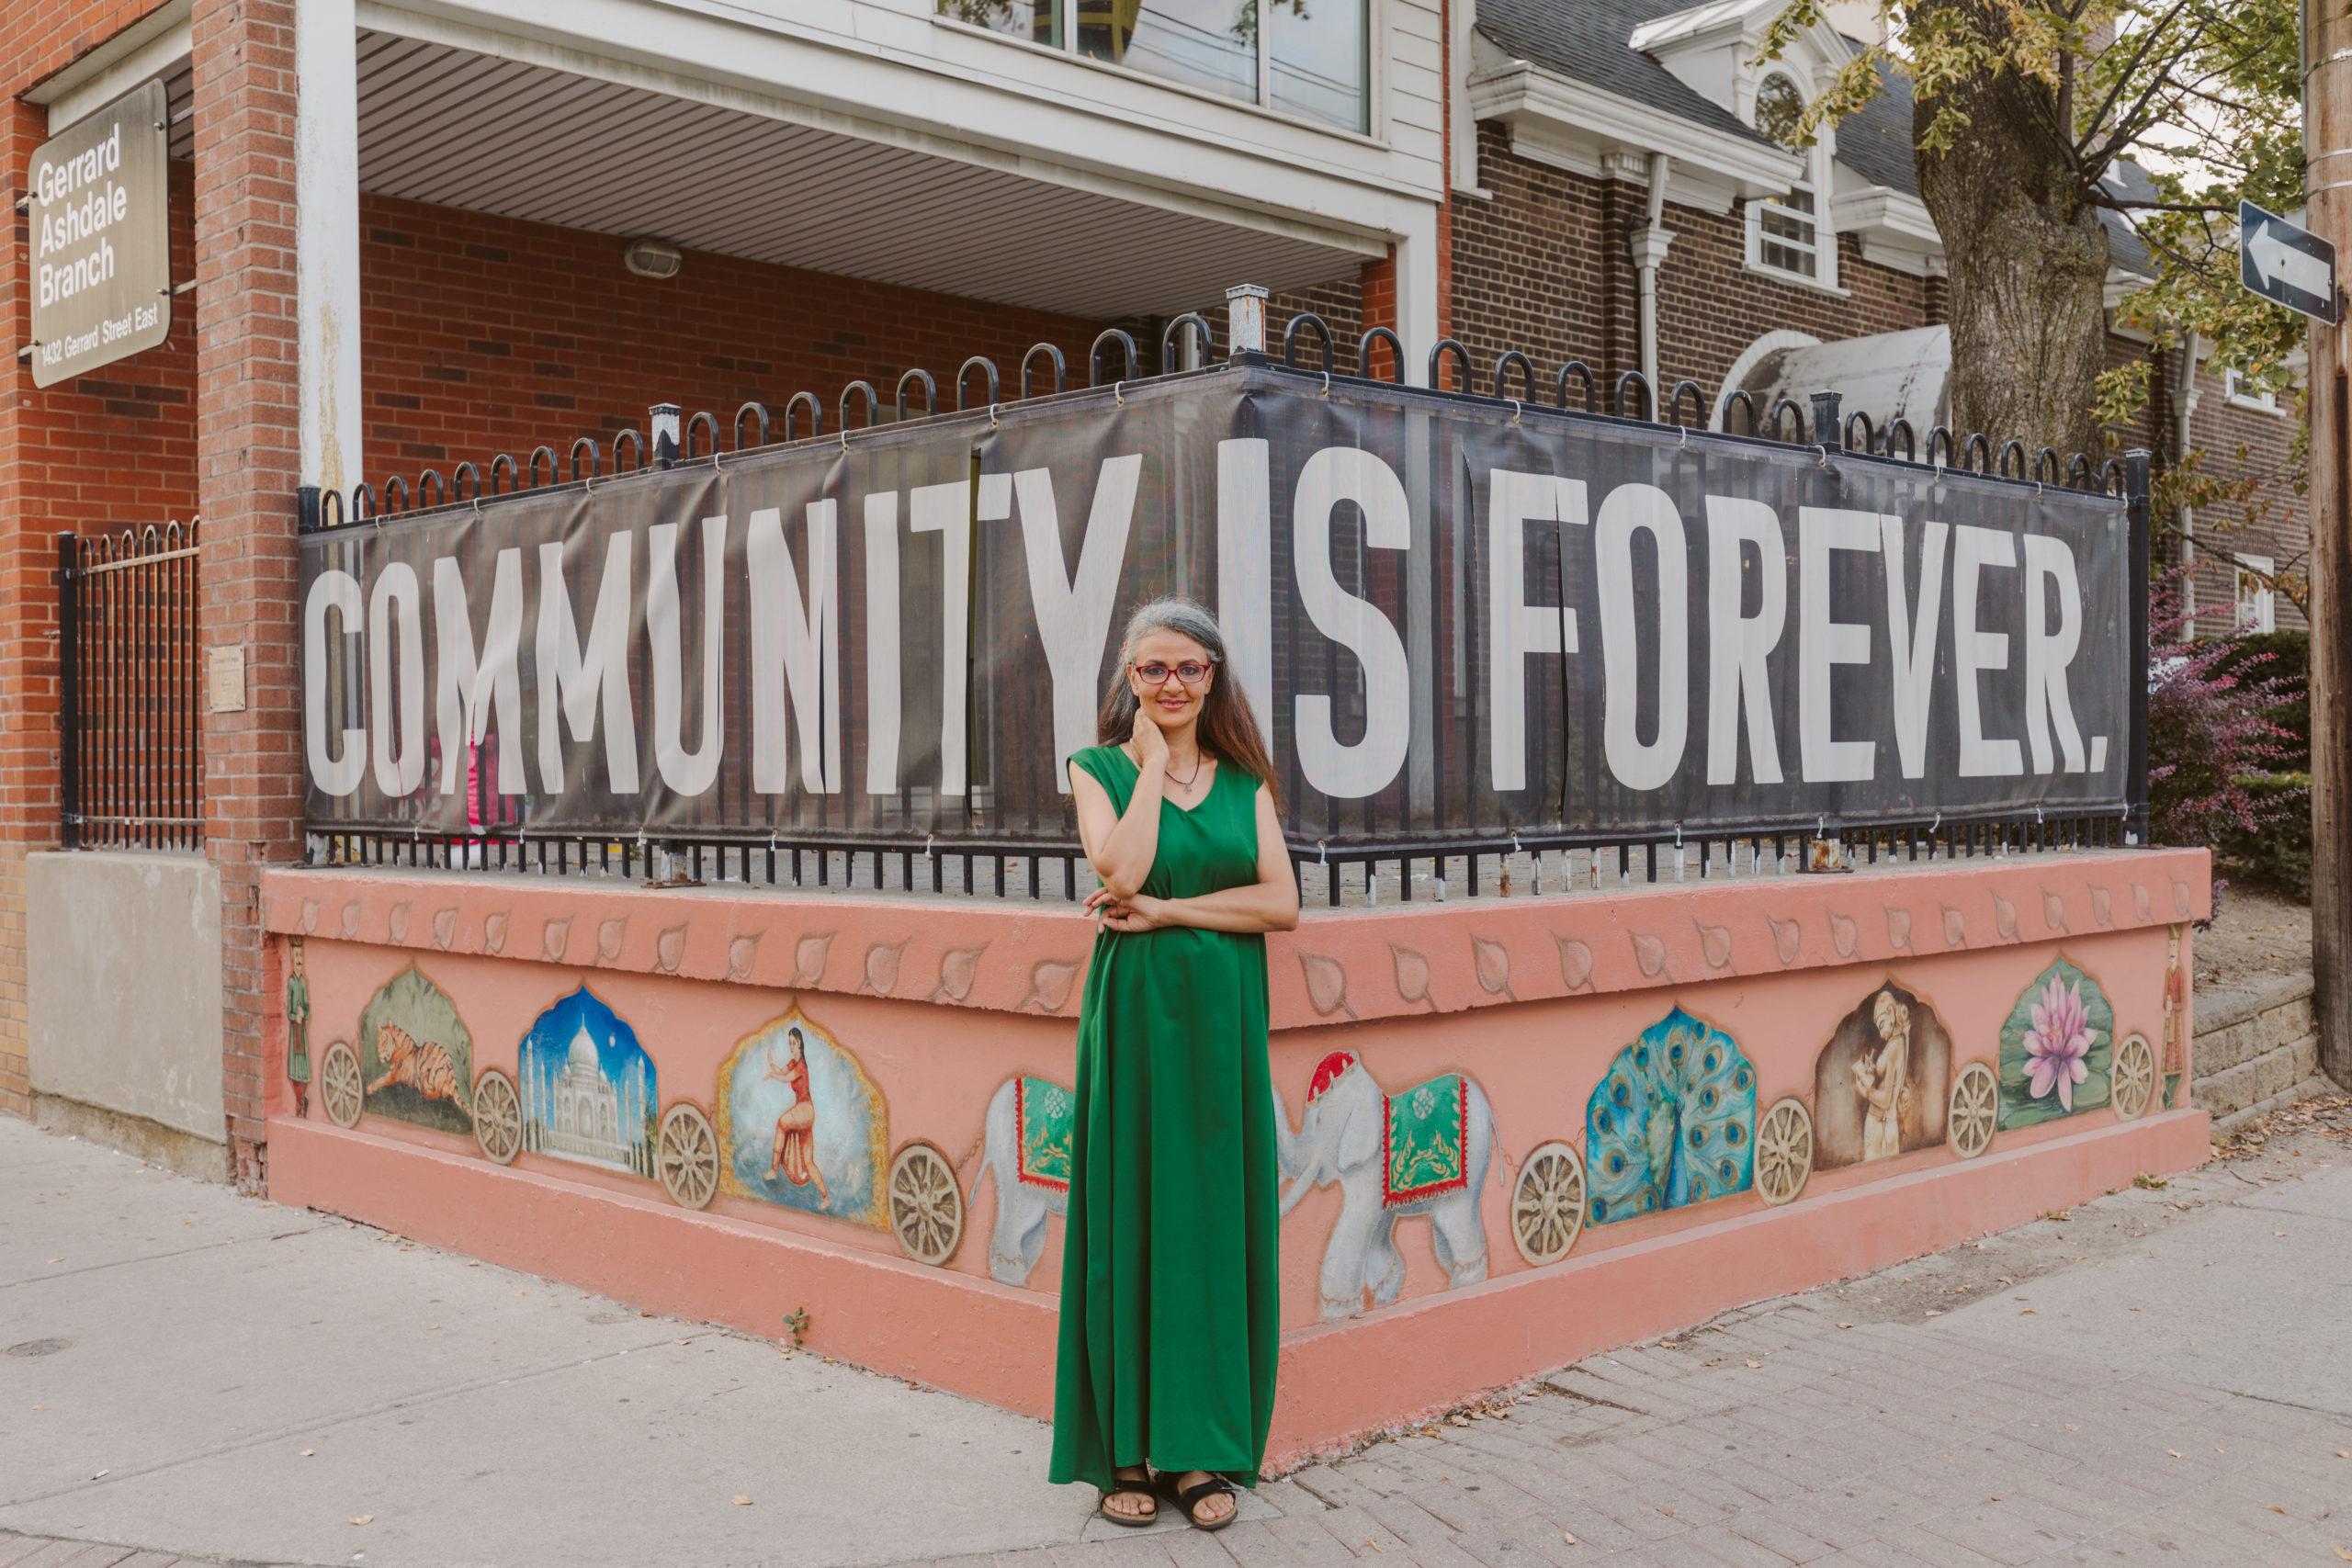 Maryem Tollar - Community is forever